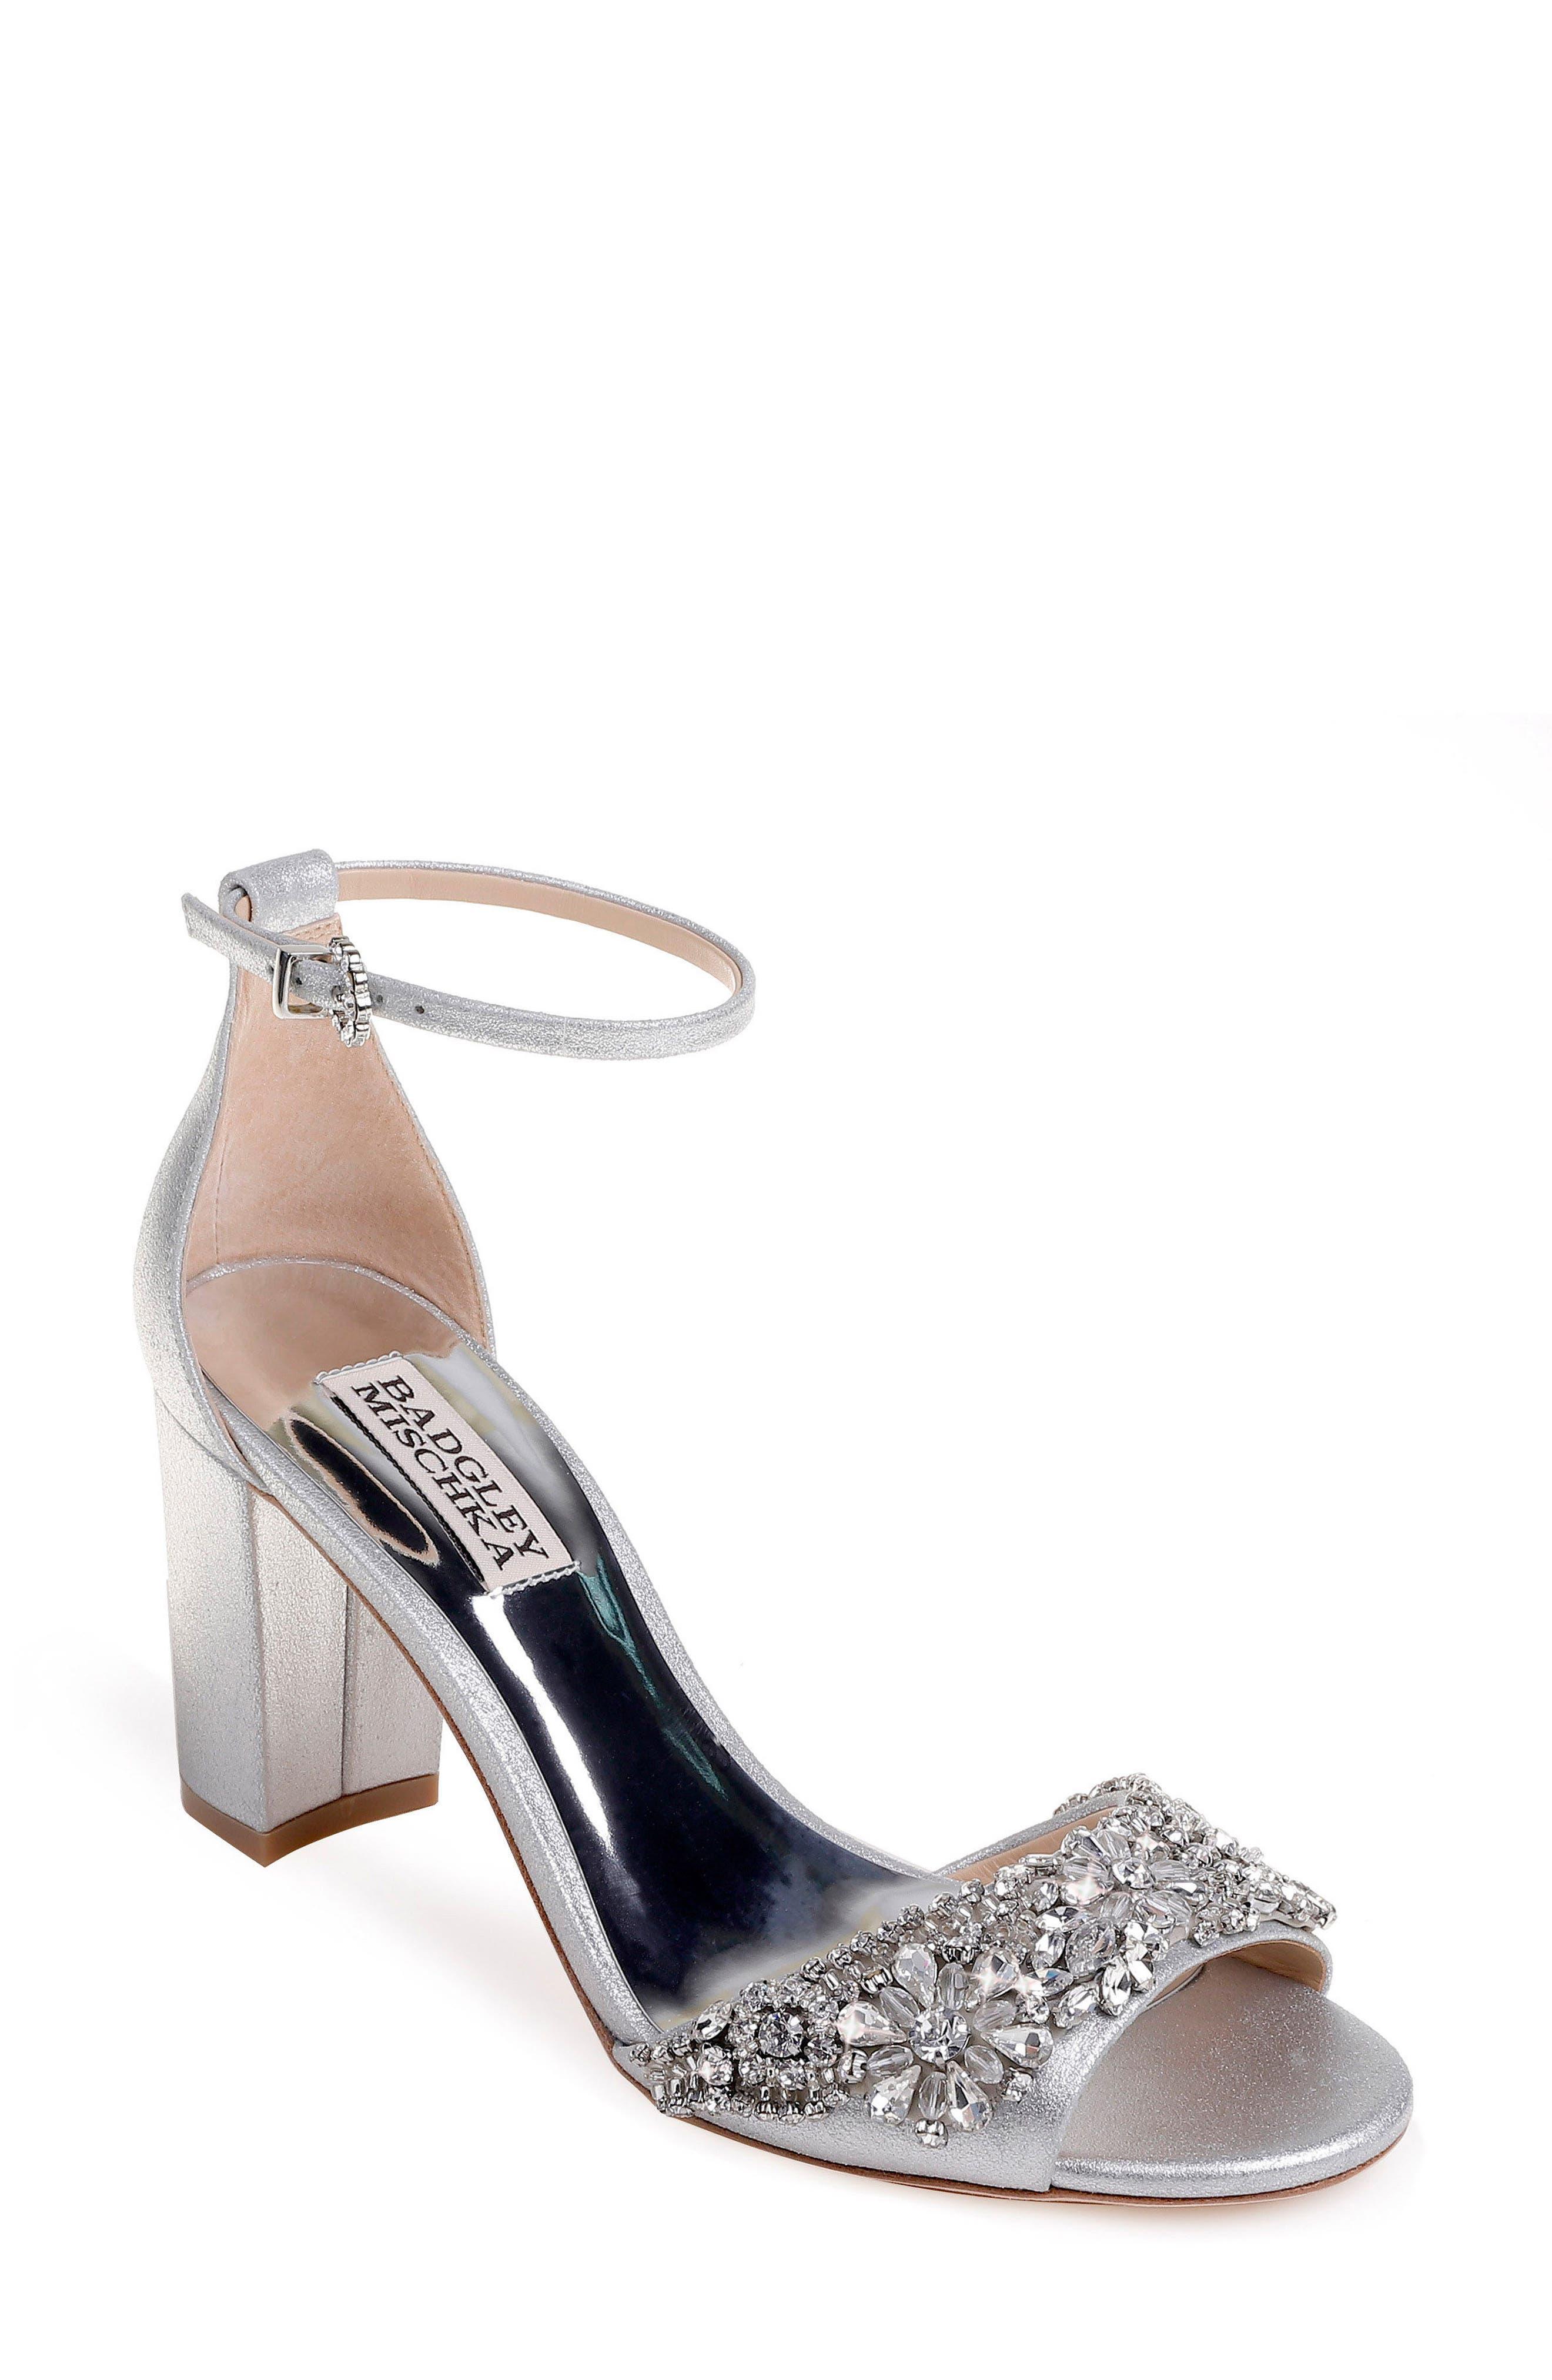 Hines Embellished Block Heel Sandal,                         Main,                         color, SILVER METALLIC SUEDE